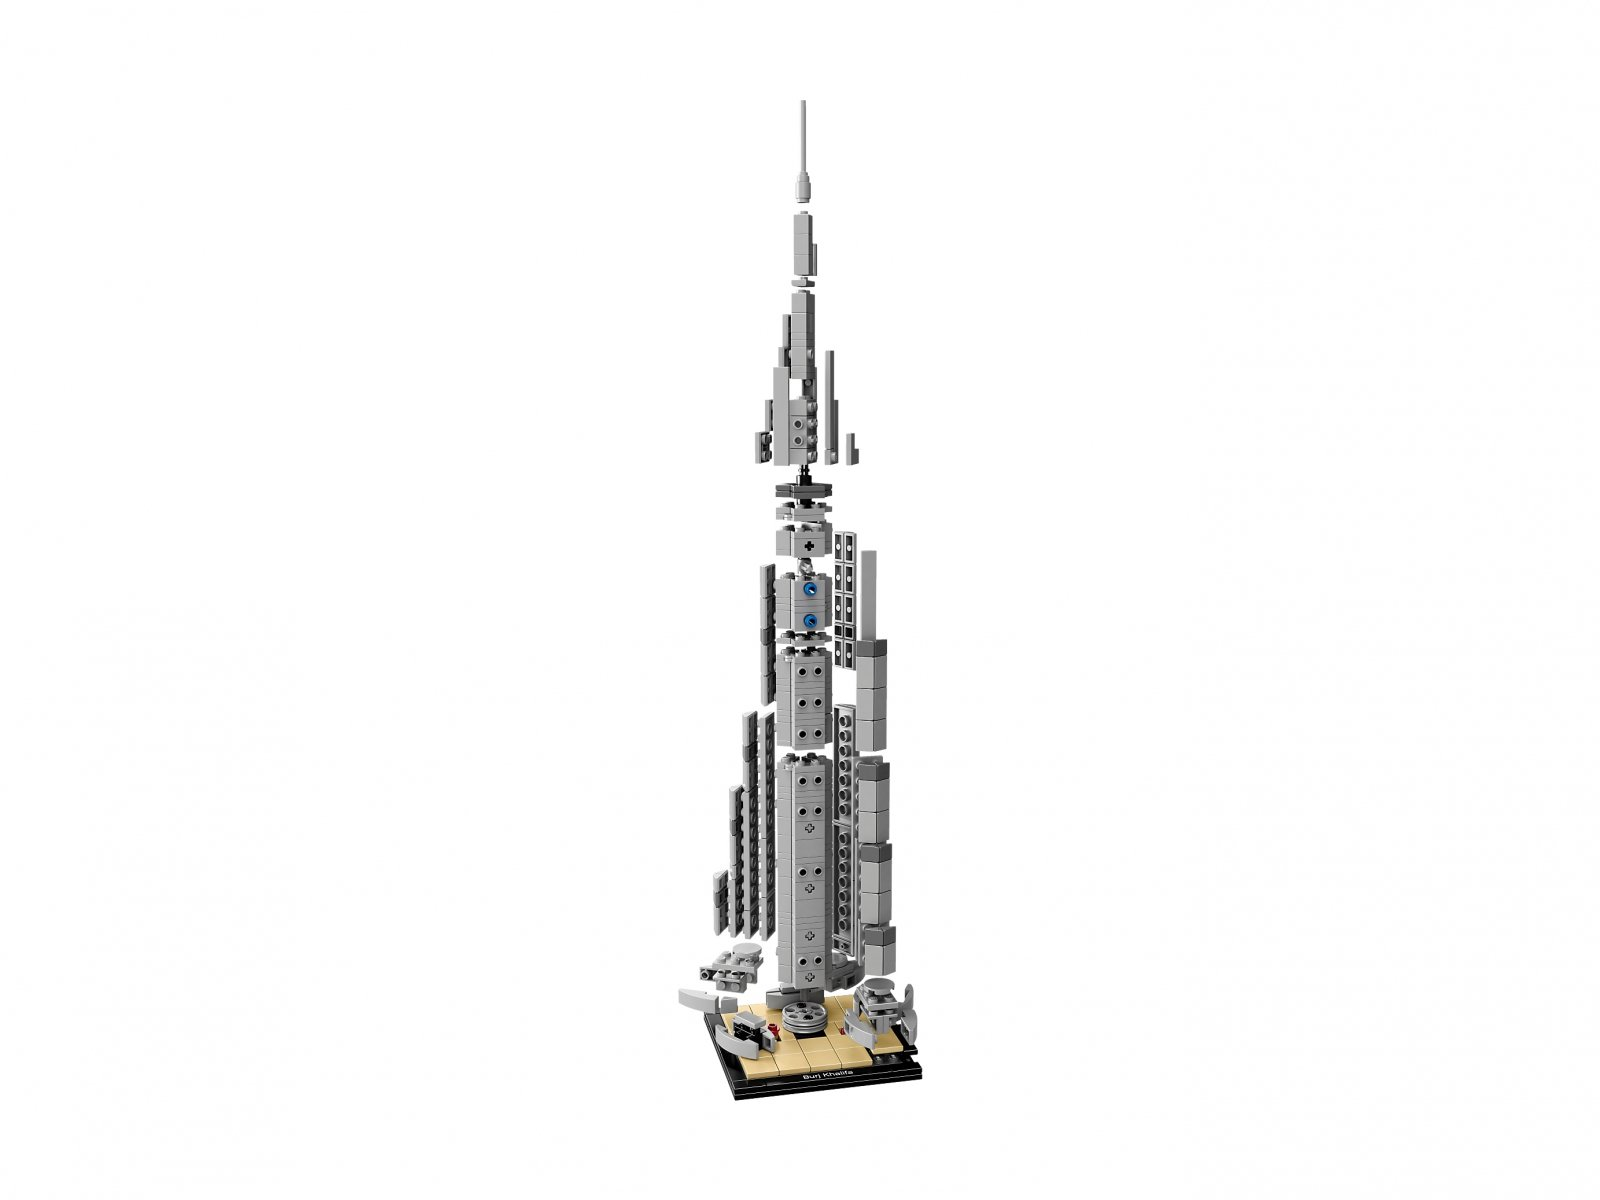 LEGO Architecture Burj Khalifa 21031